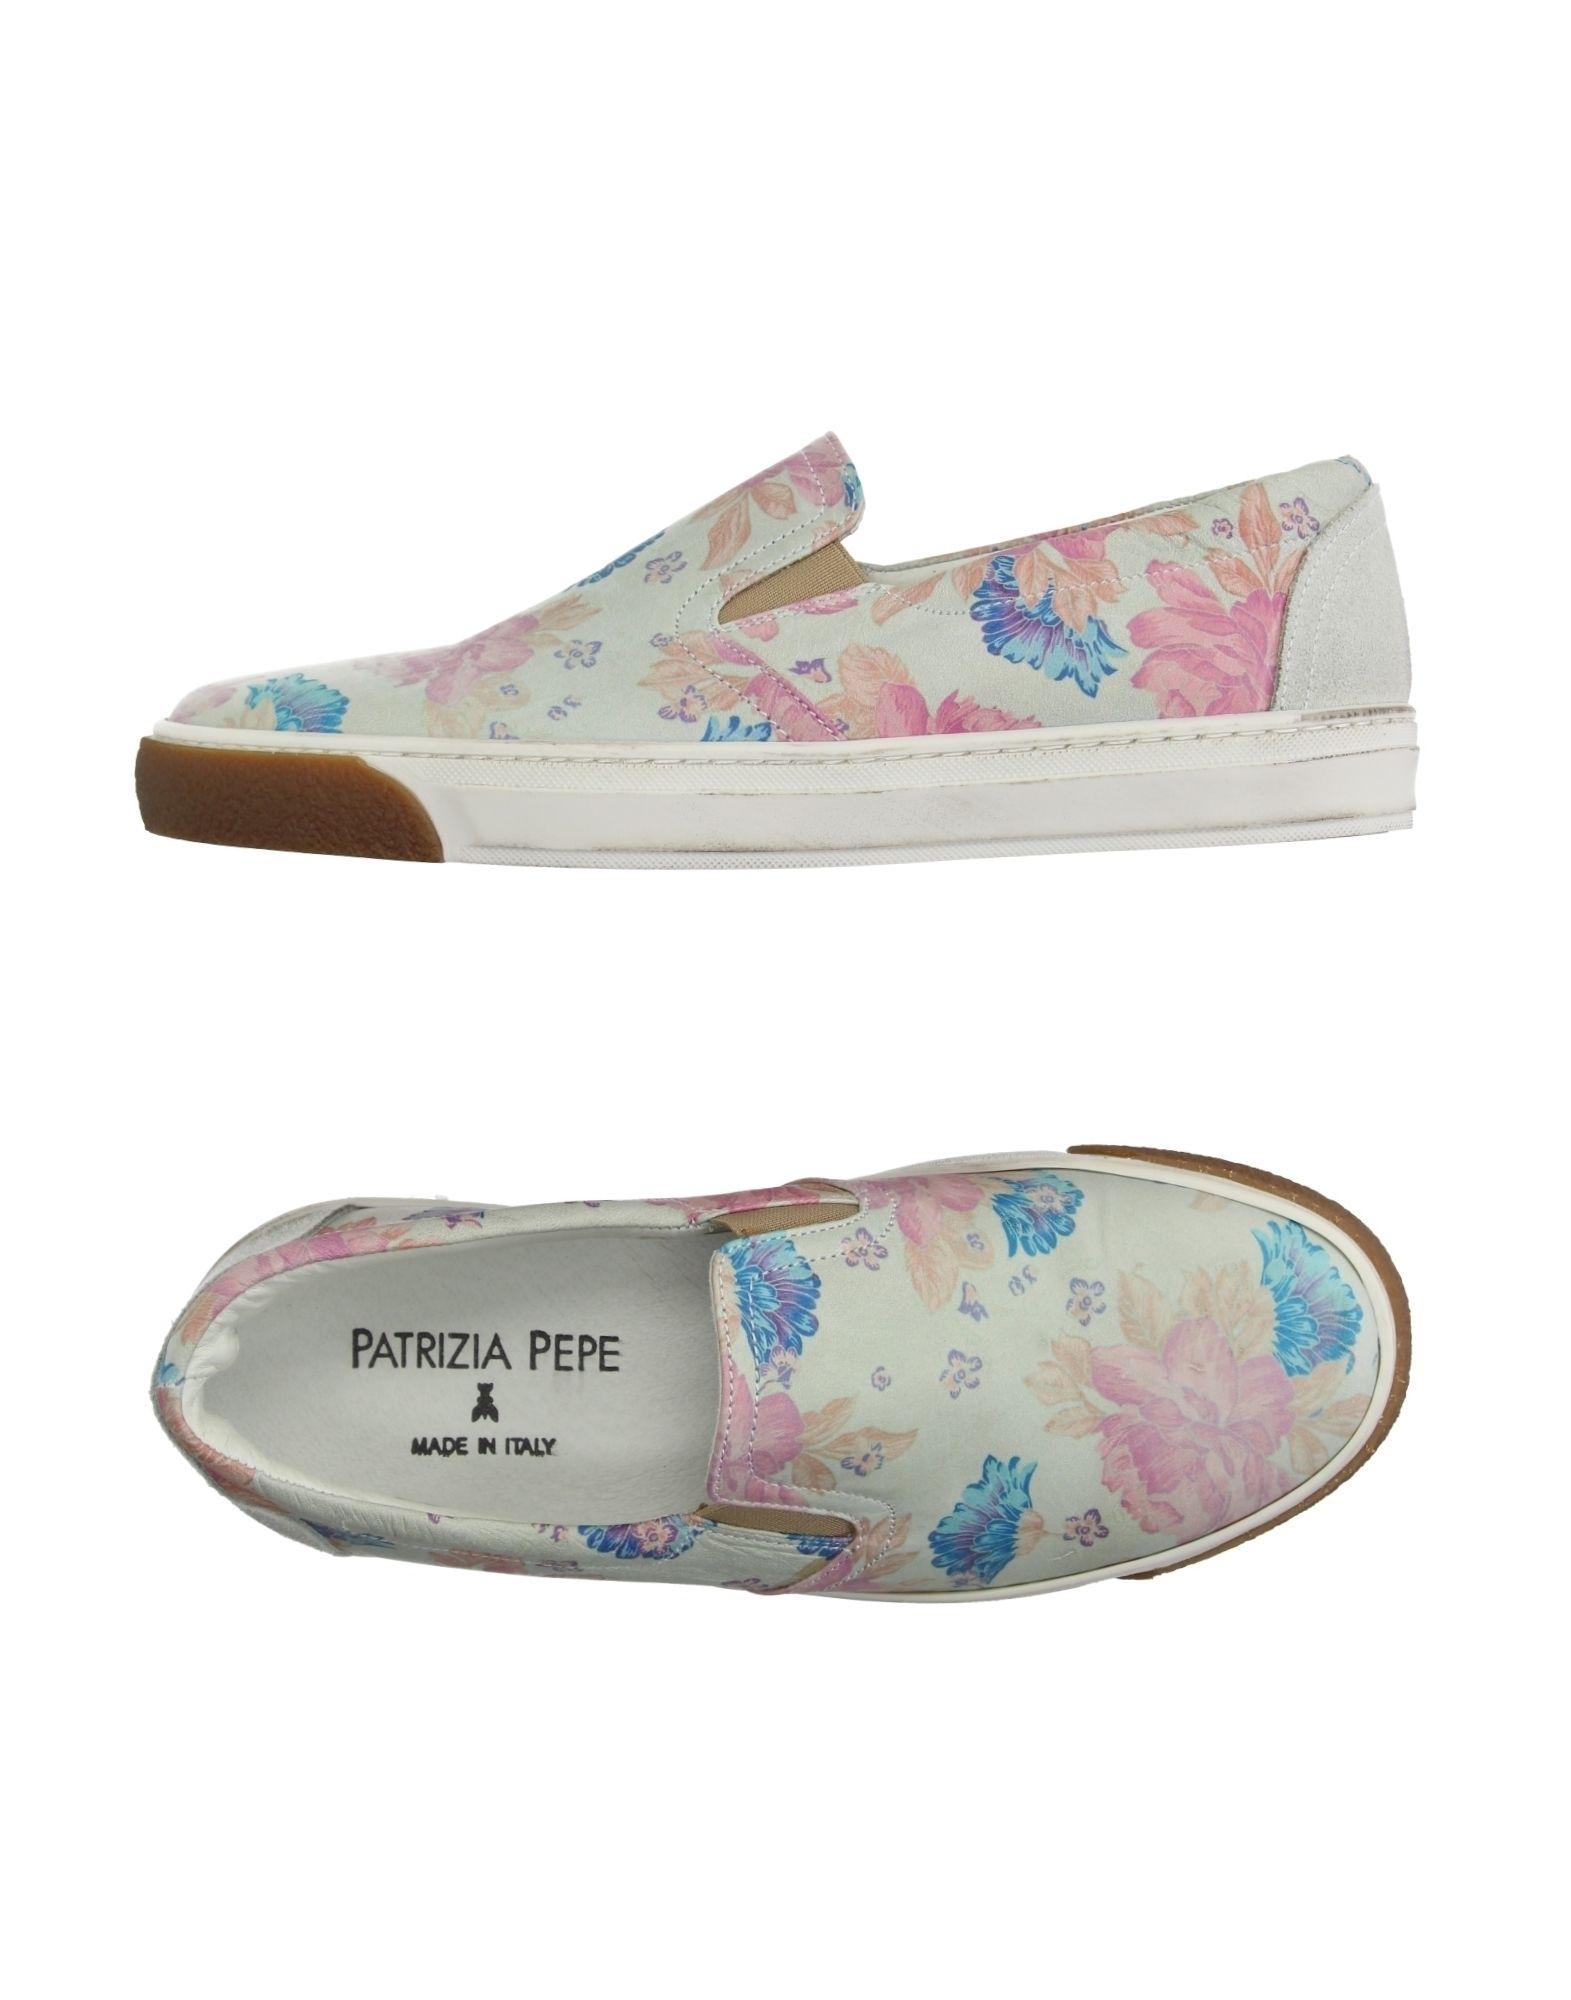 Patrizia Pepe Sneakers Damen  11173314EU Gute Qualität beliebte Schuhe